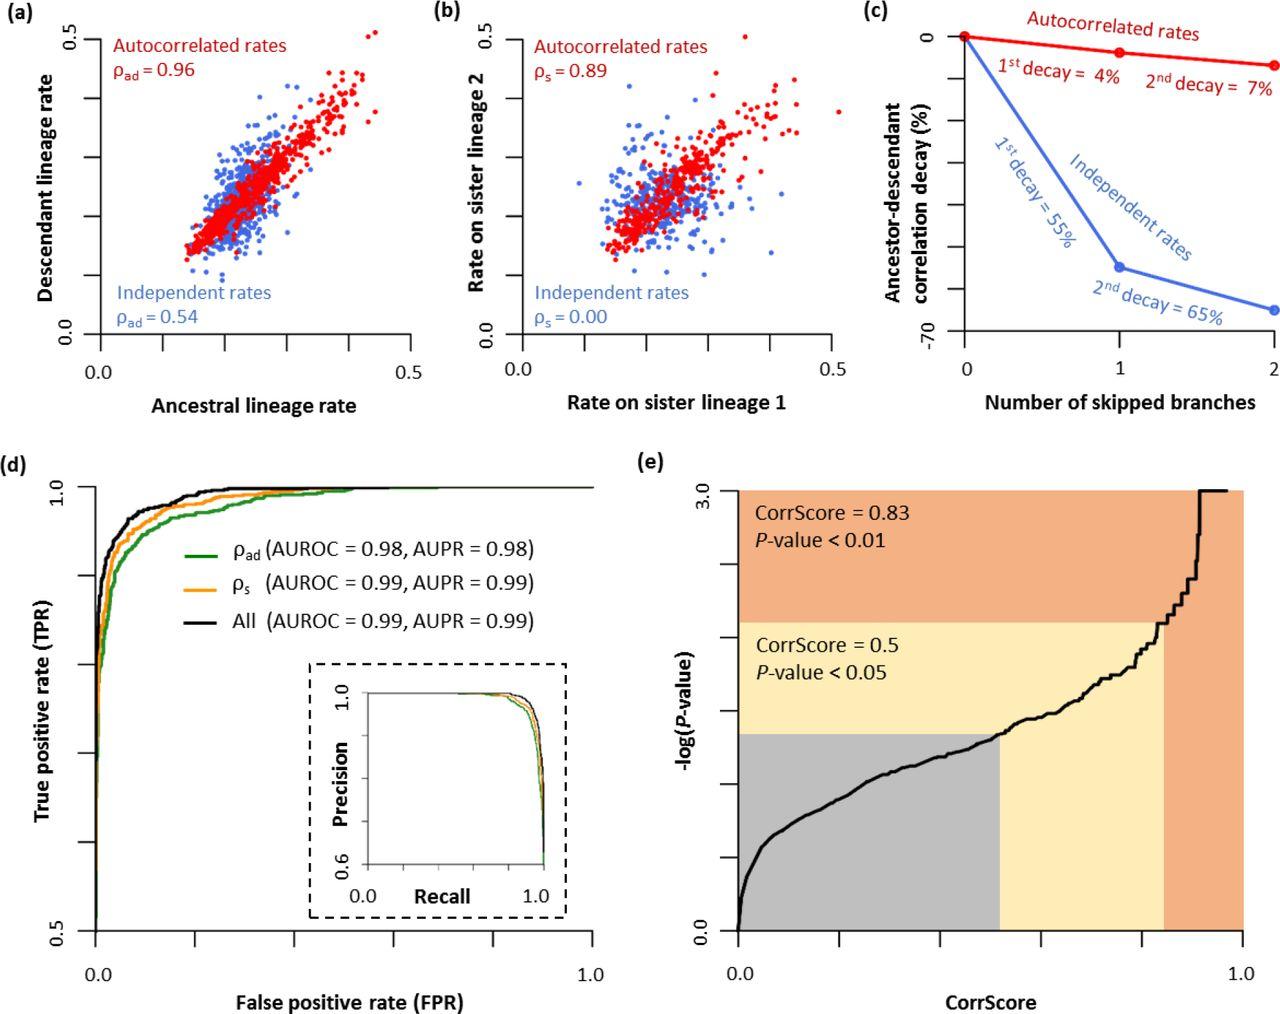 A new method for detecting autocorrelation of evolutionary